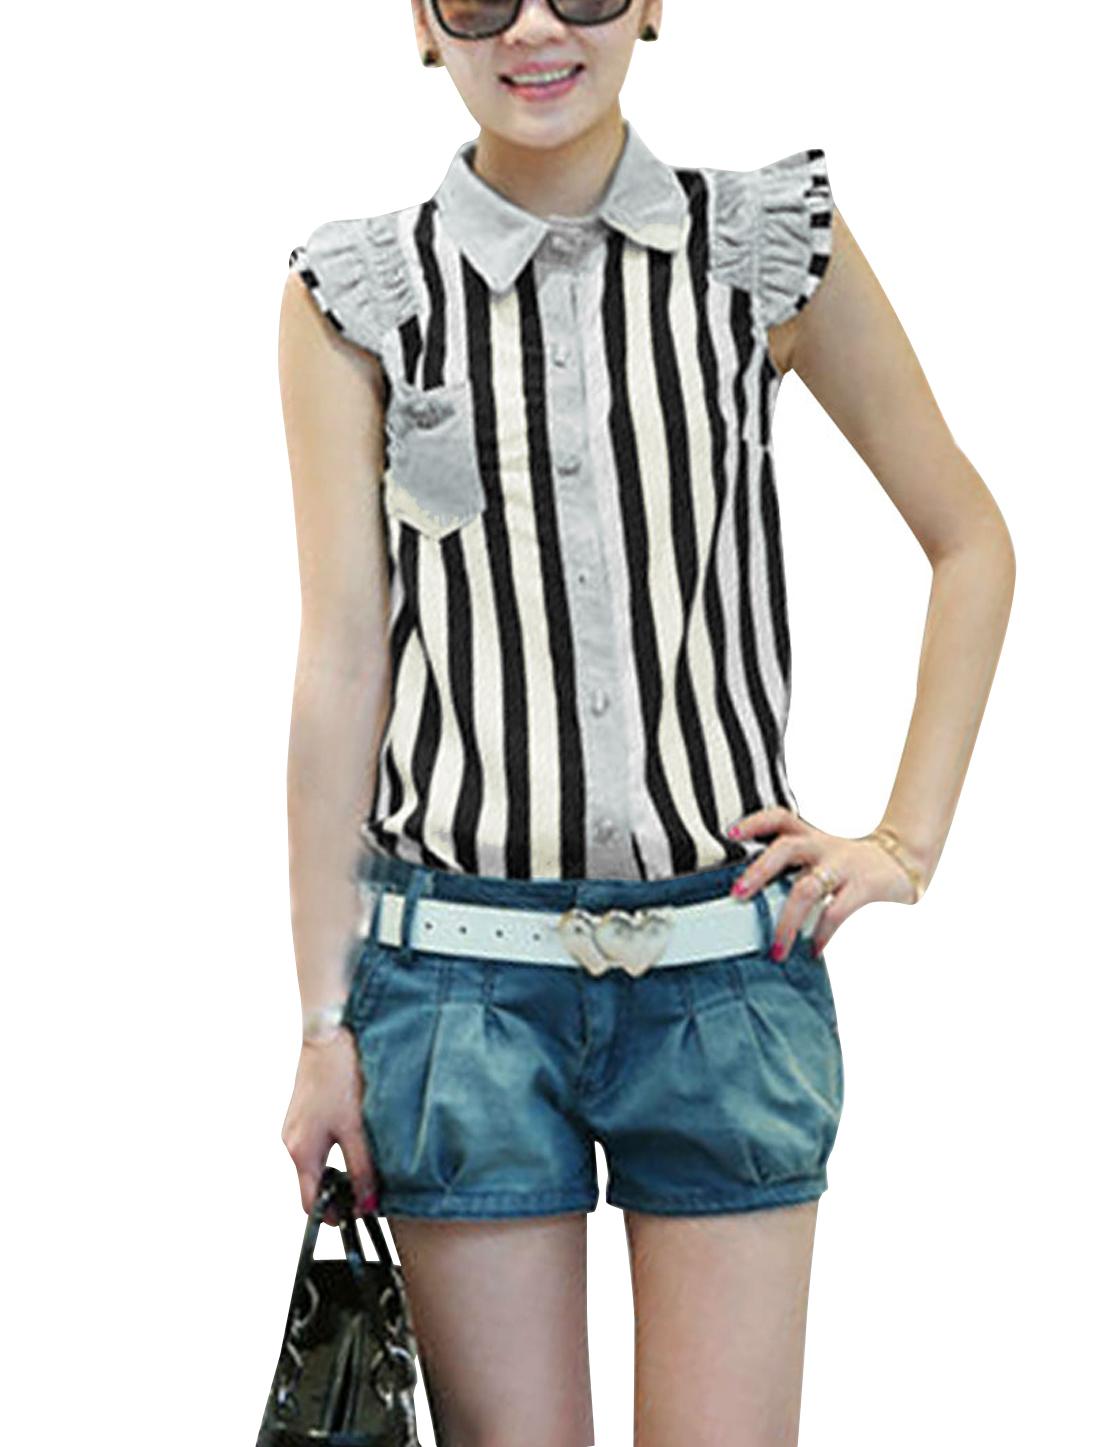 Ladies Black White Cap Sleeves Stripes Prints Leisure Button Down Shirt S